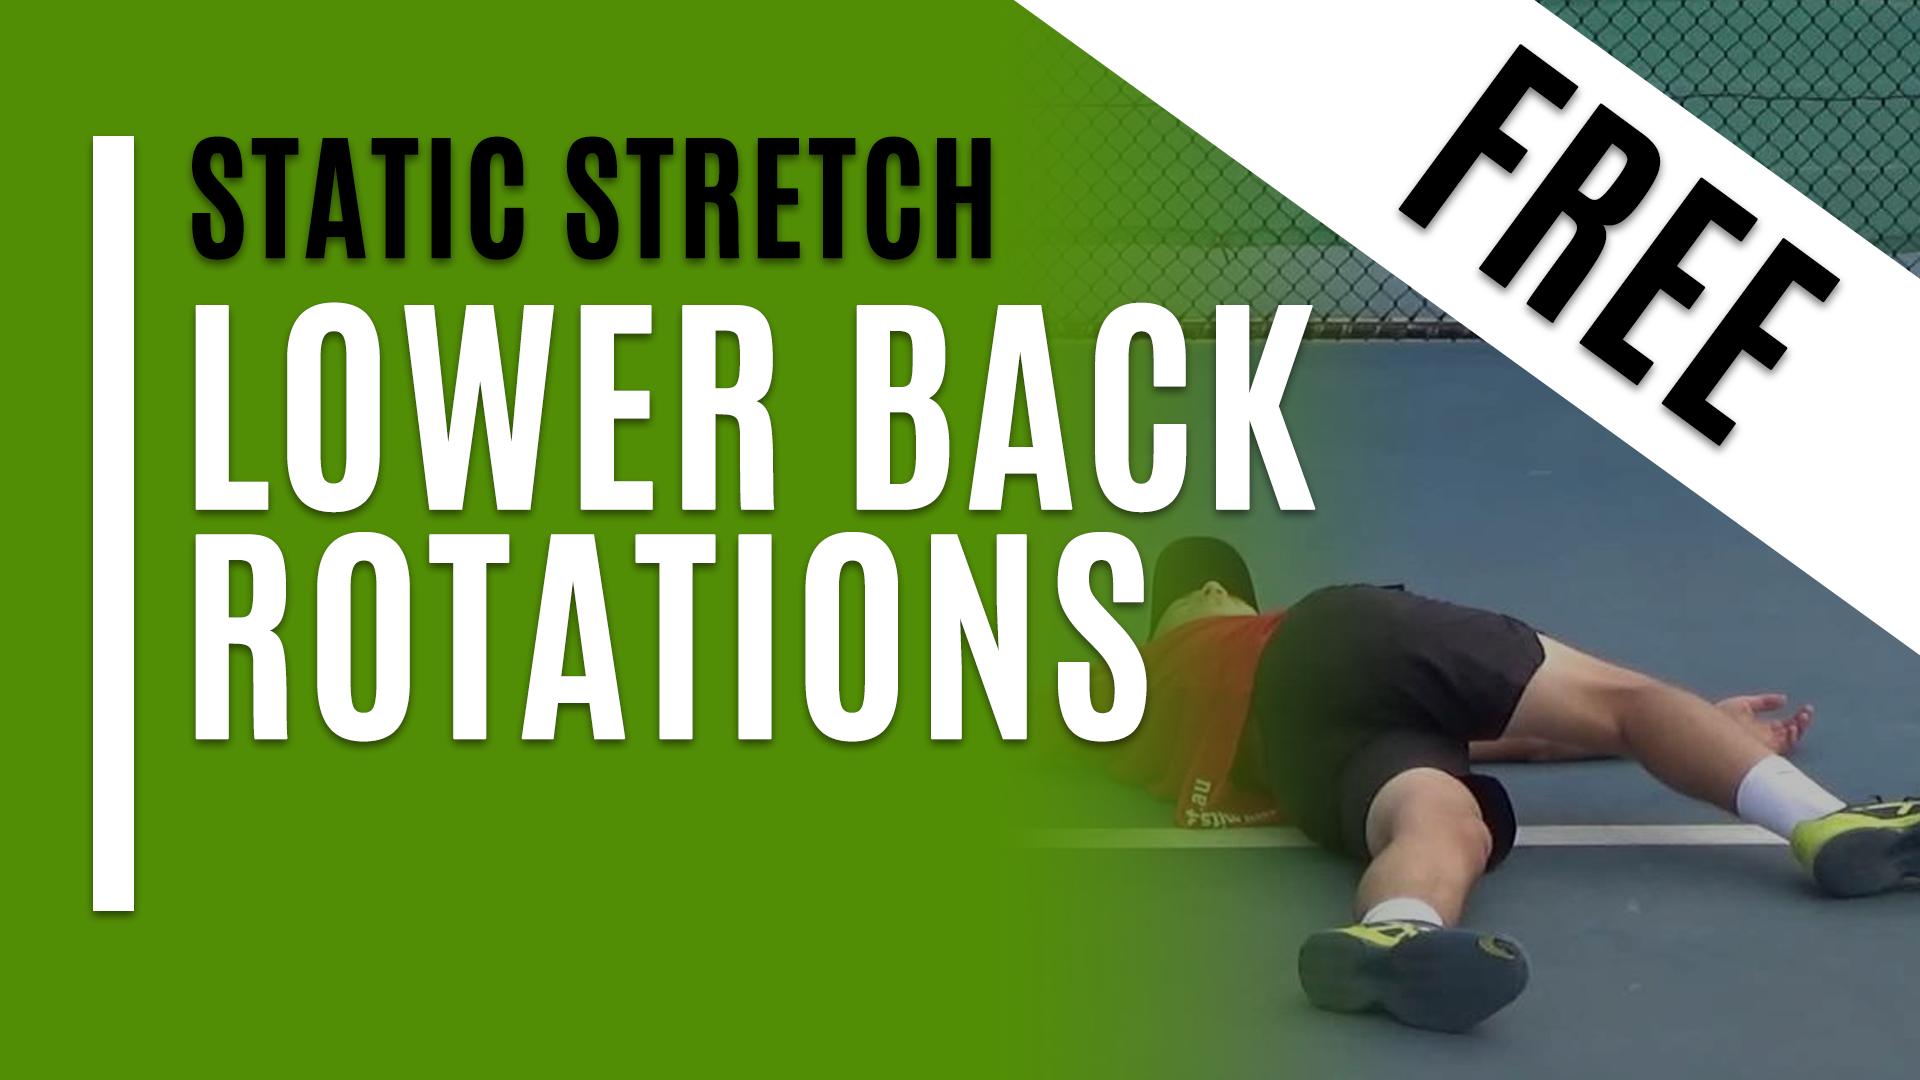 Lower Back Rotations